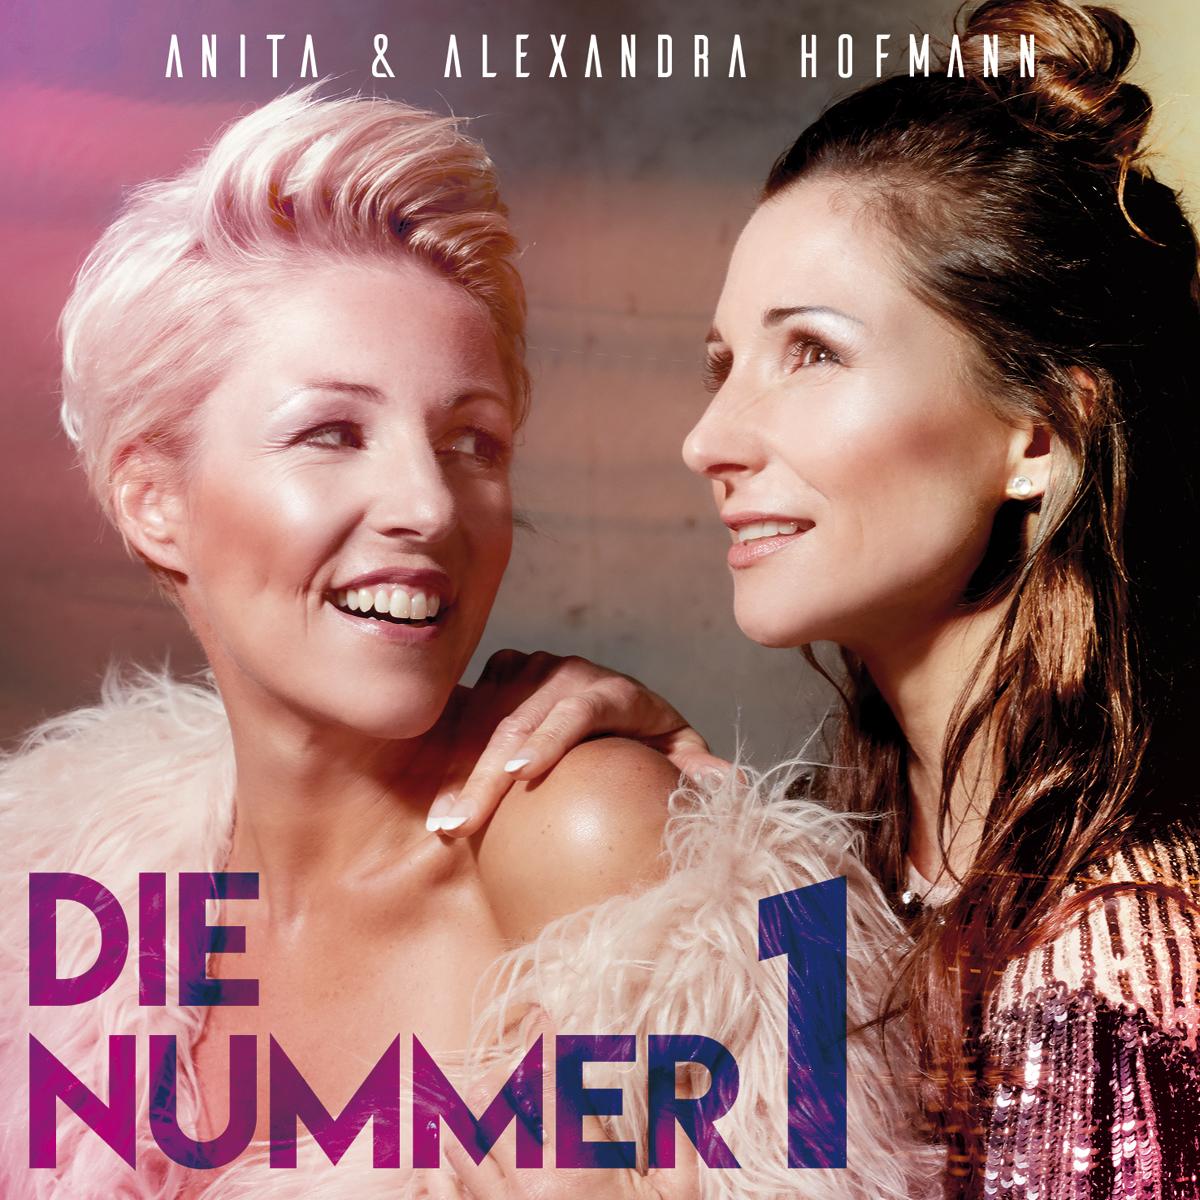 ANITA & ALEXANDRA HOFMANN * Die Nummer 1